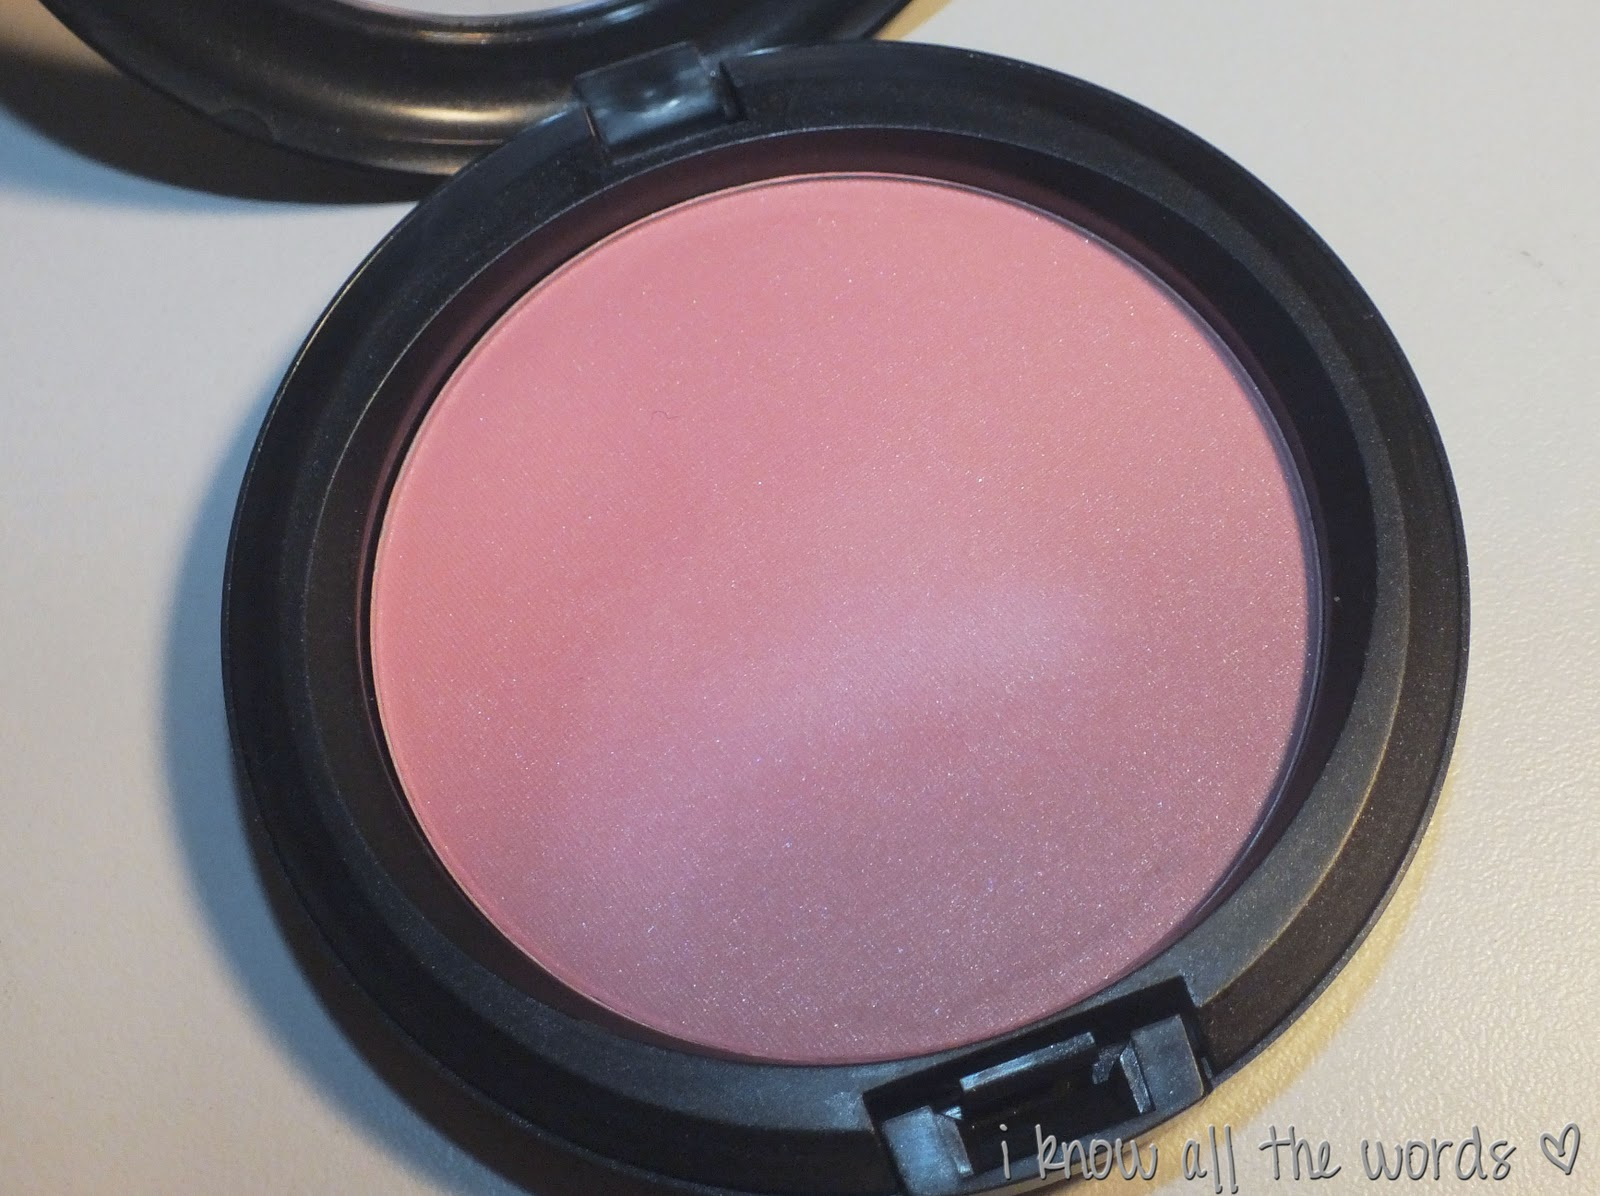 mac azalea blossom blush - photo #2